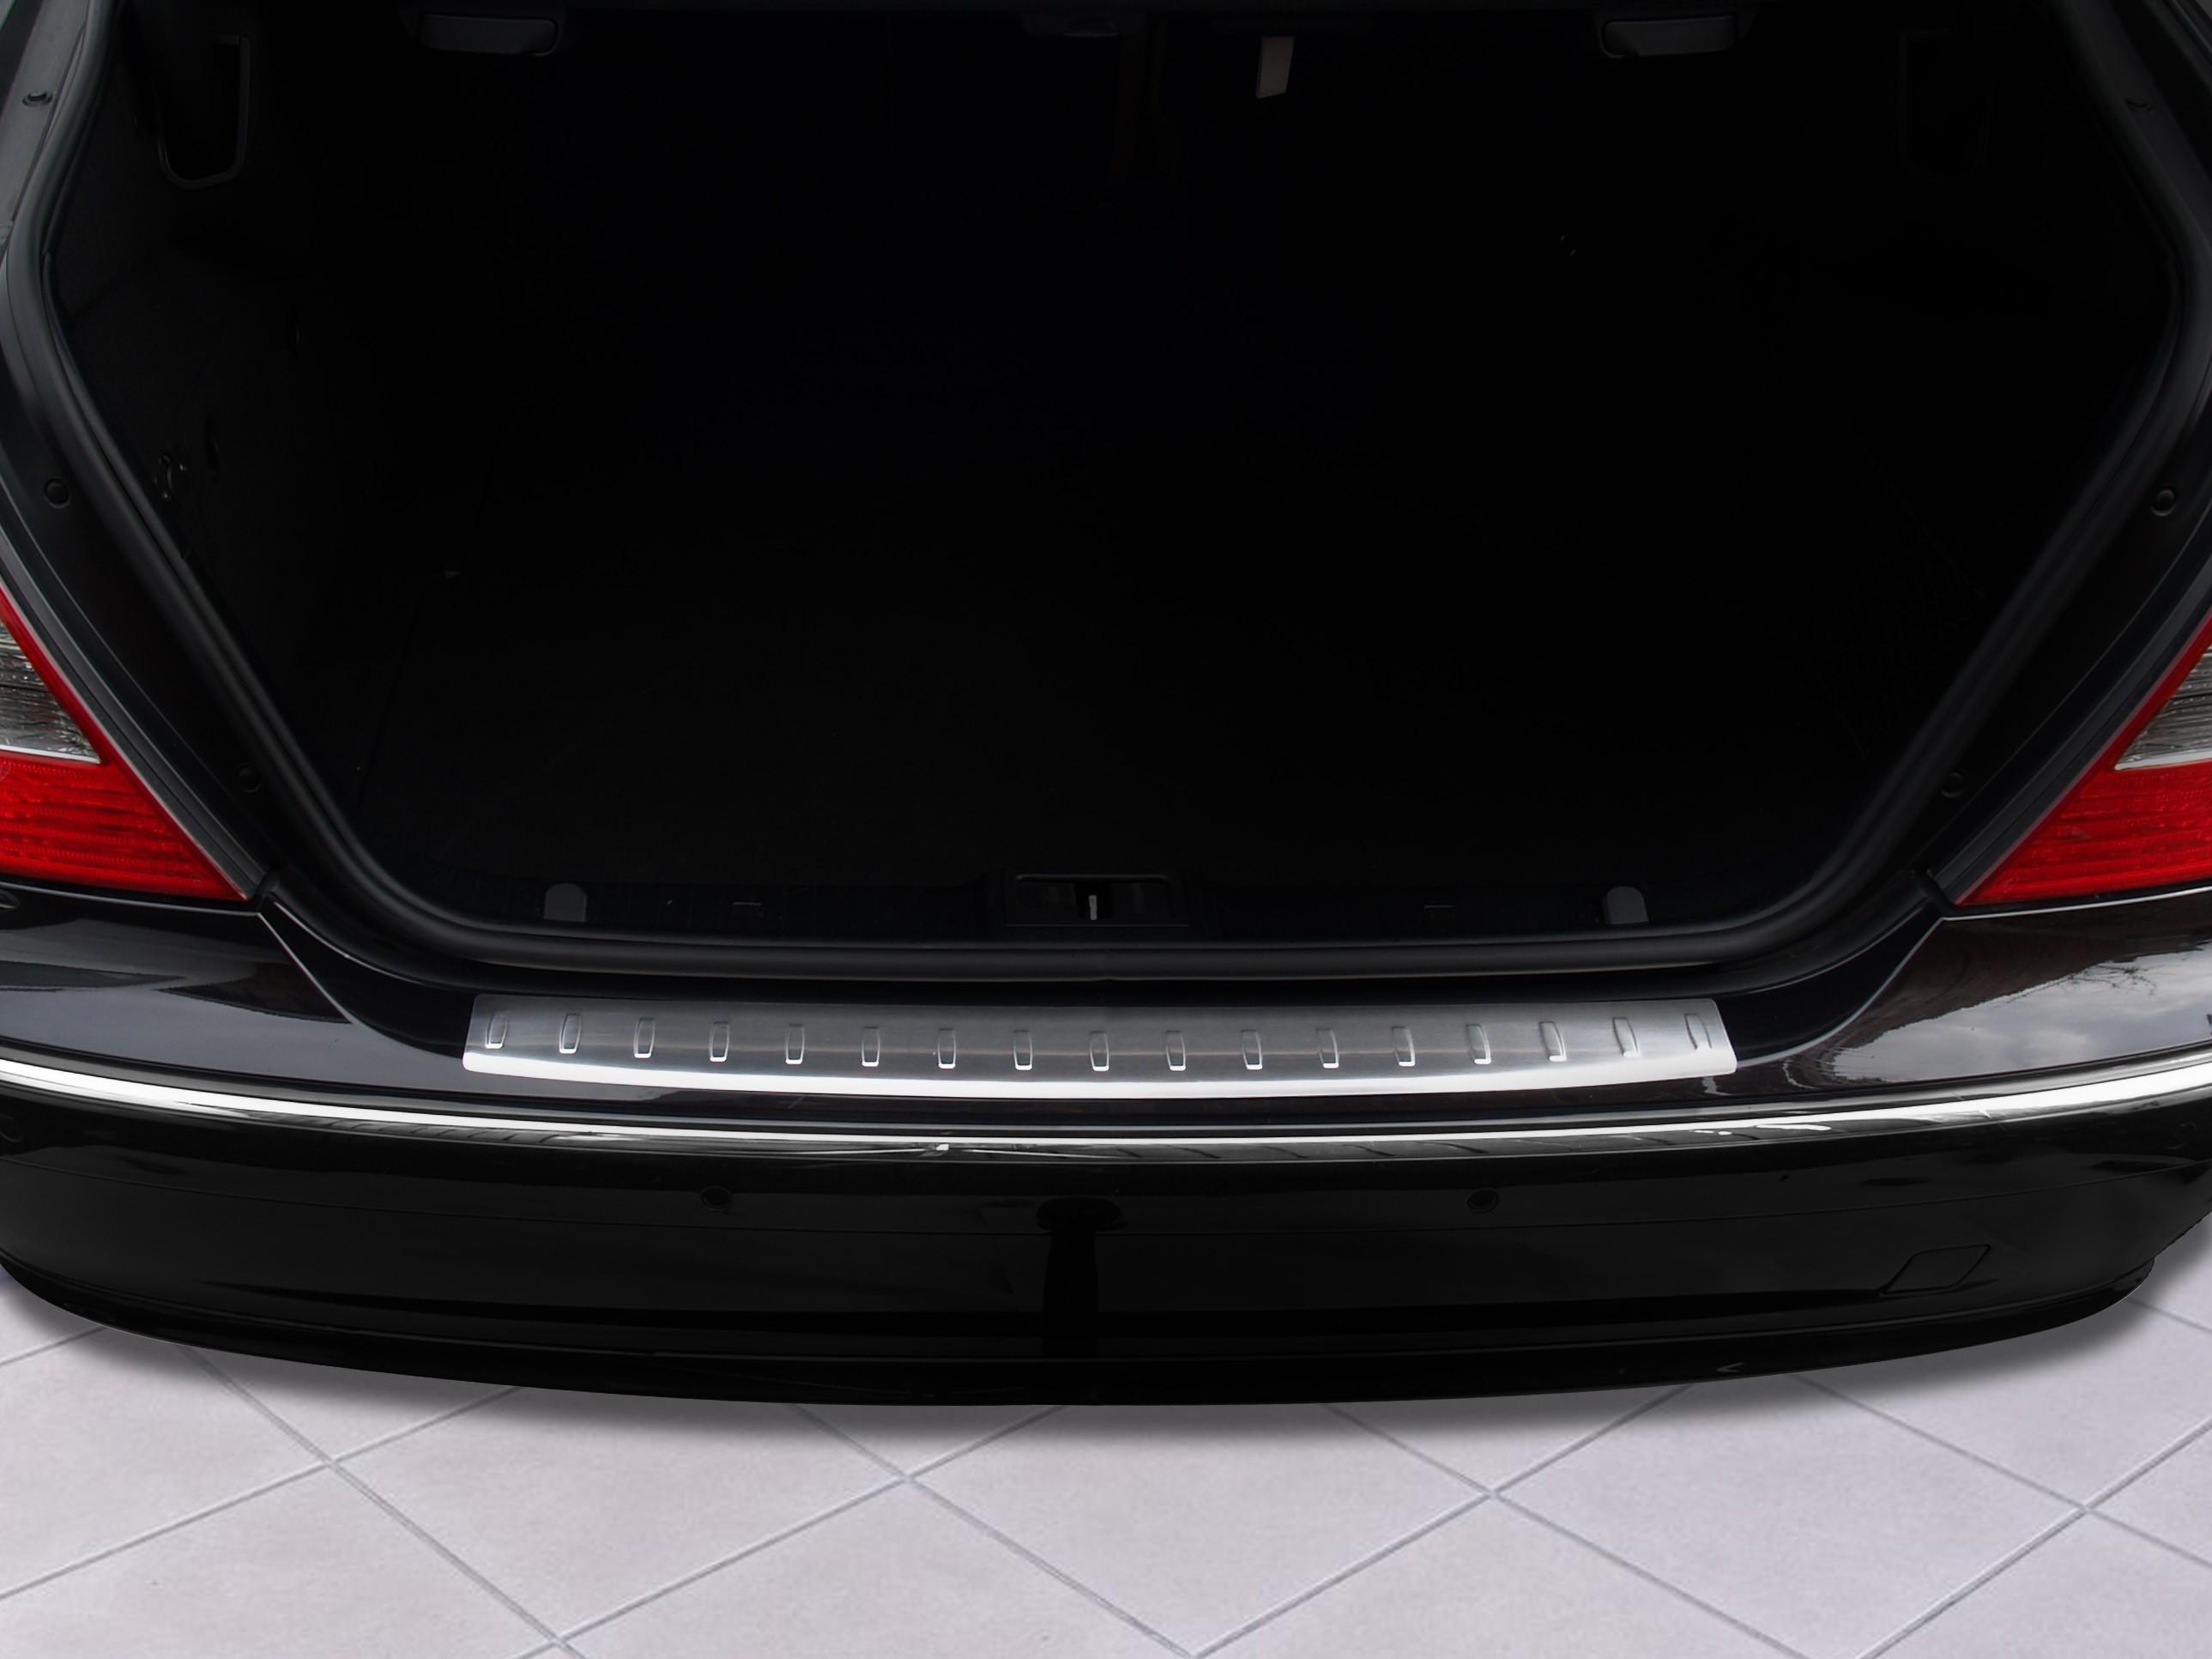 Mercedes E Class W211 Limousine profiledribs 2002-2009